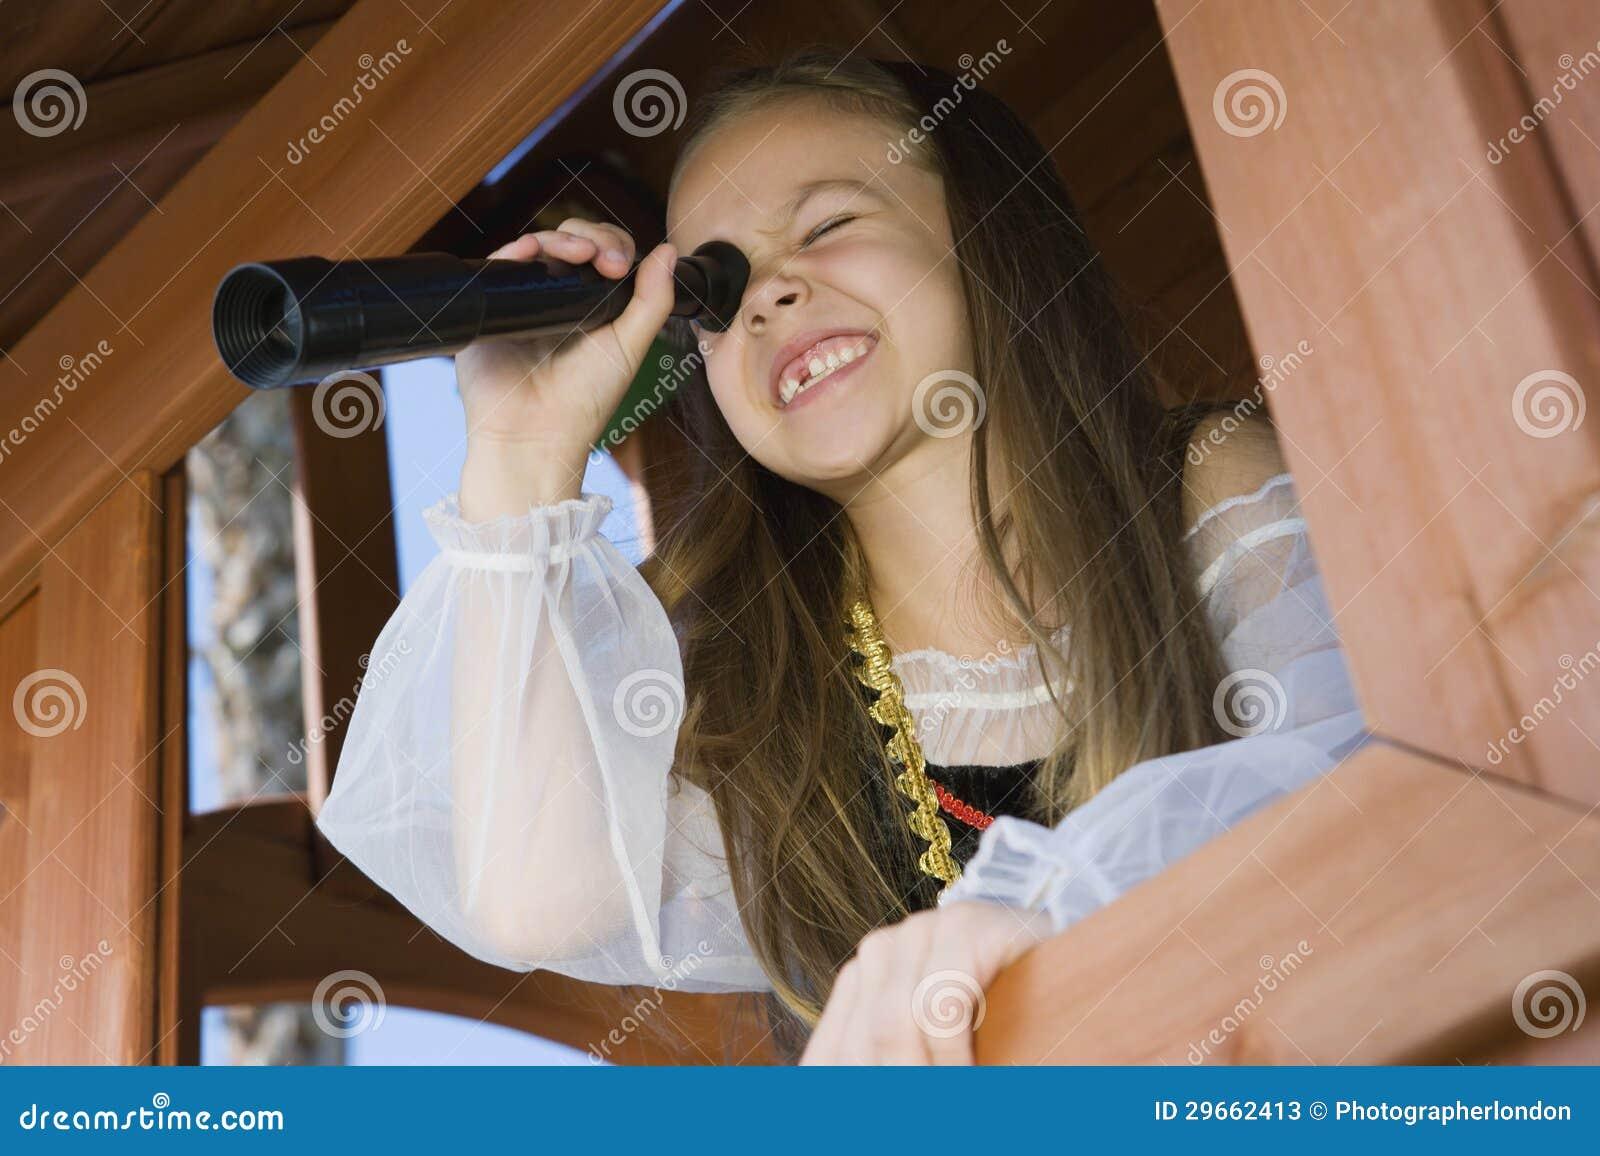 pirate girl looking through telescope vector illustration